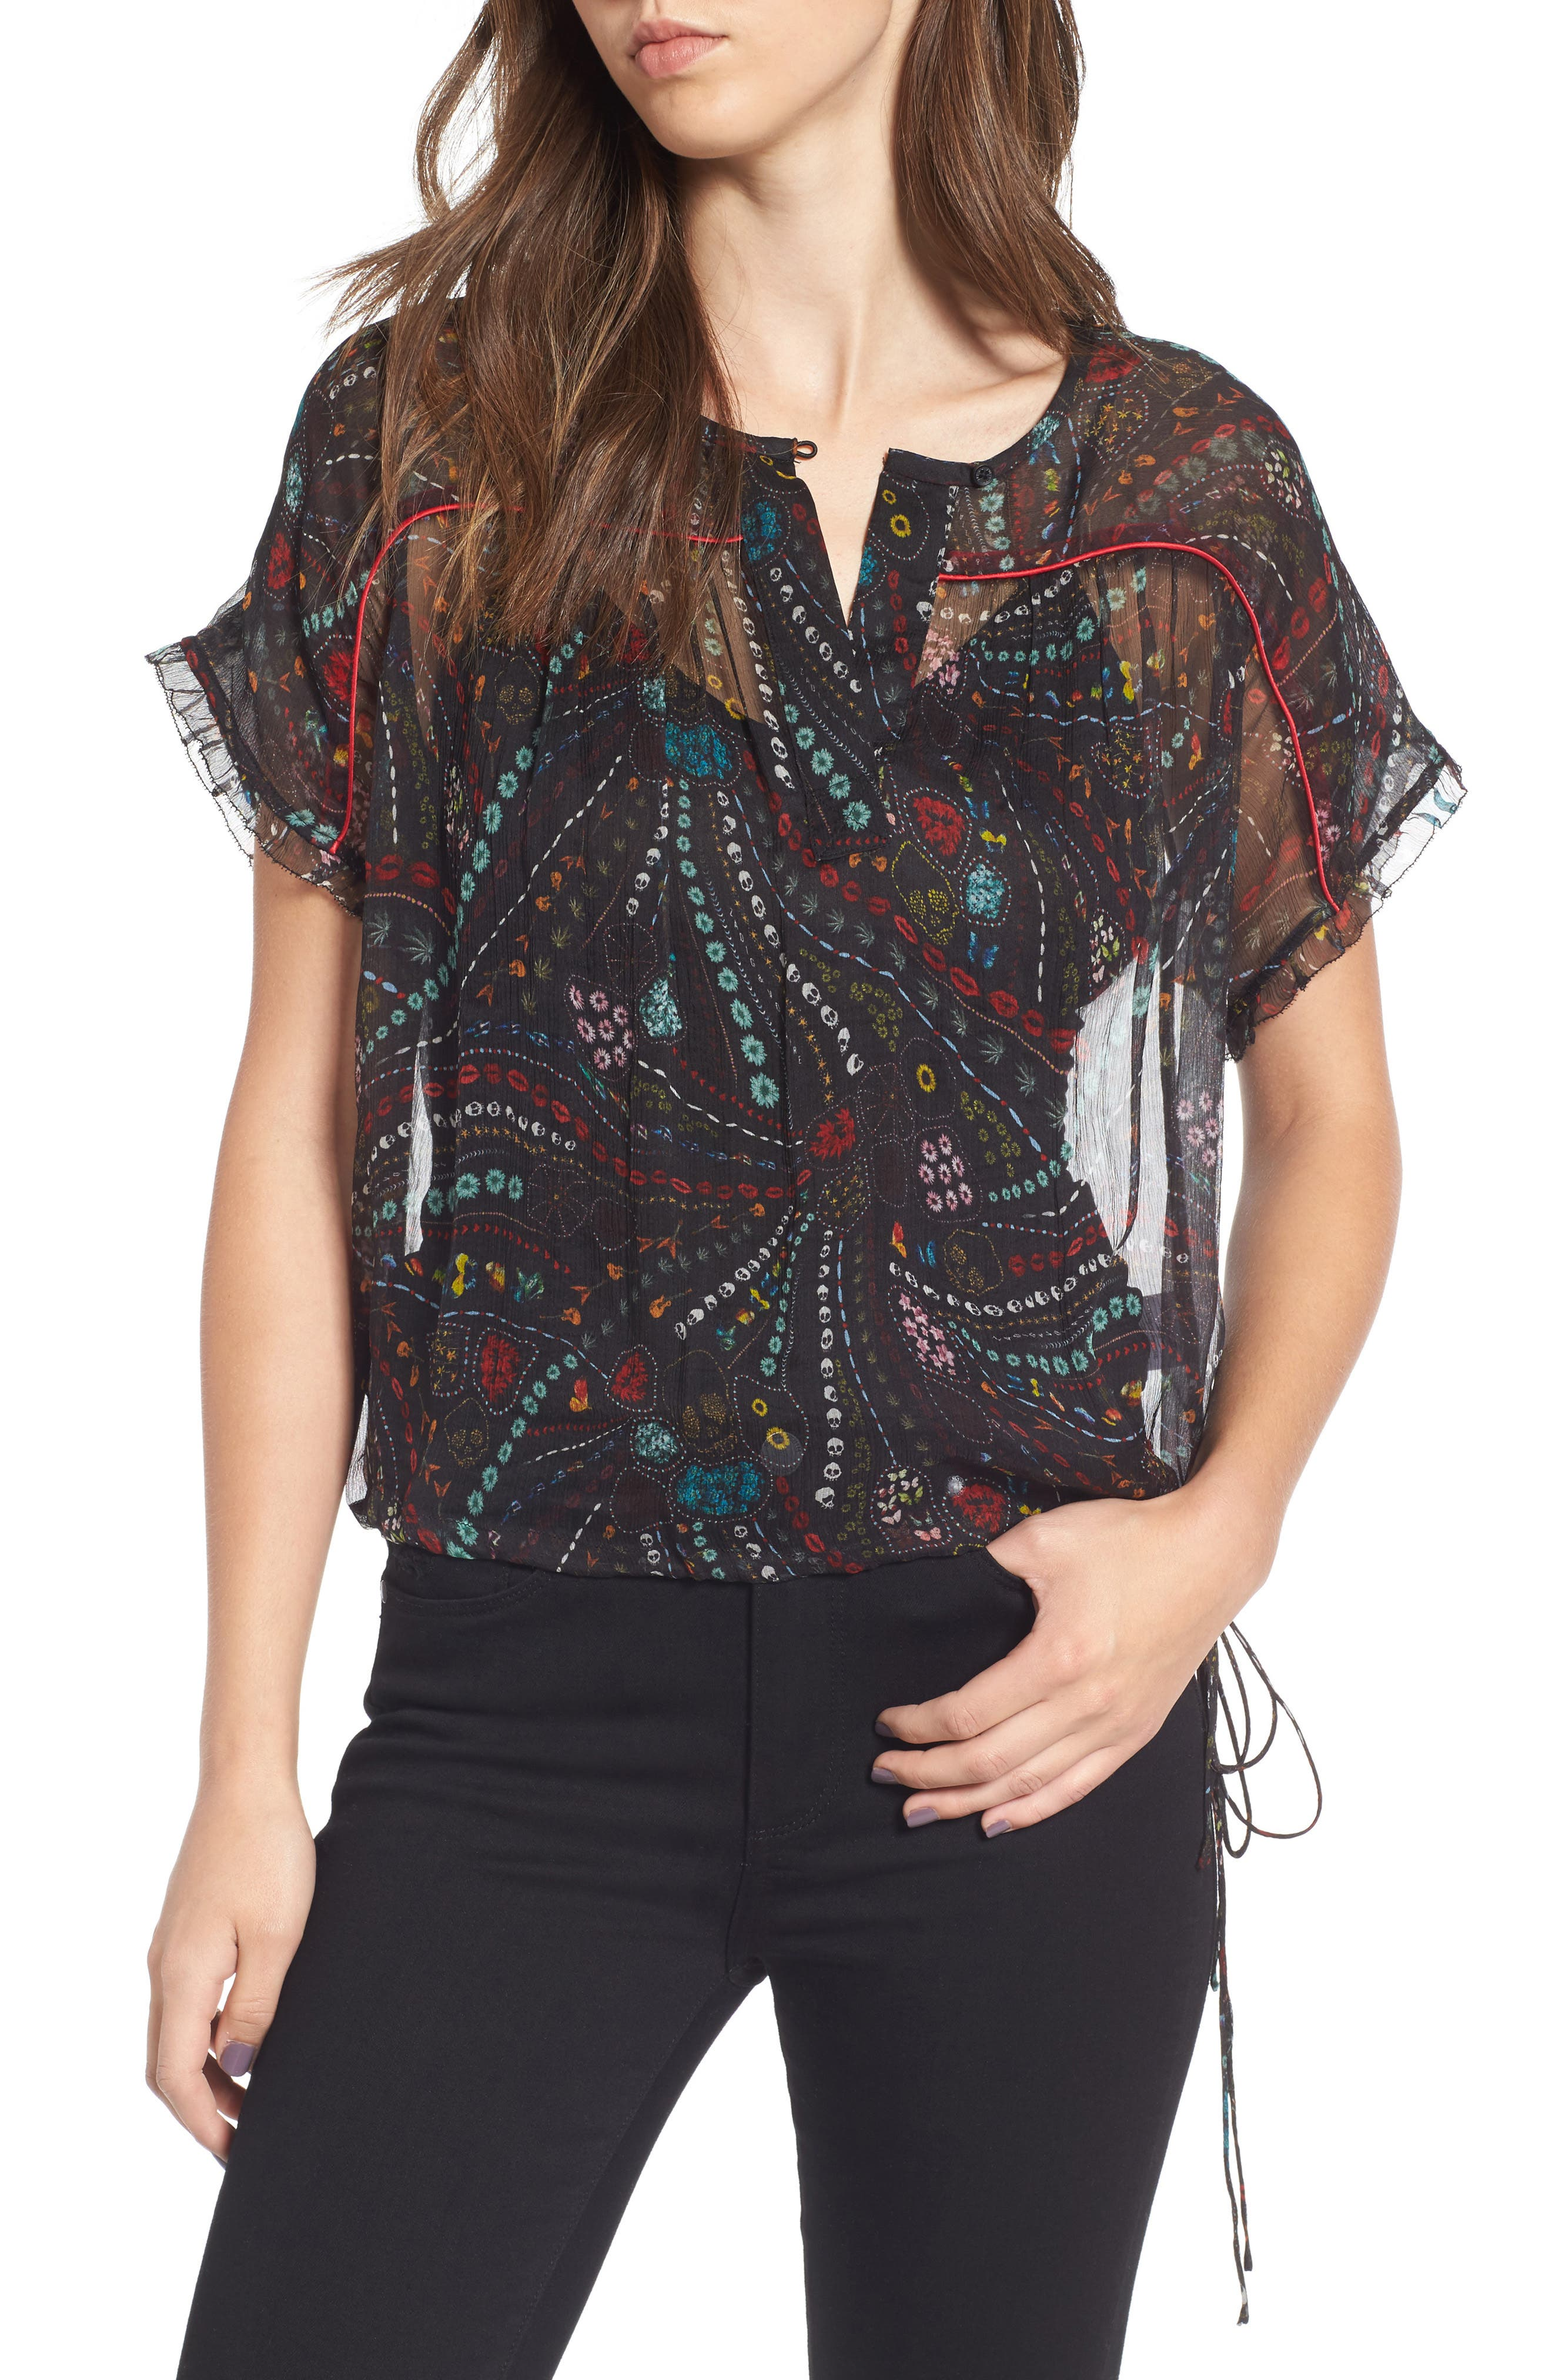 Terson Deluxe Silk Top,                         Main,                         color,